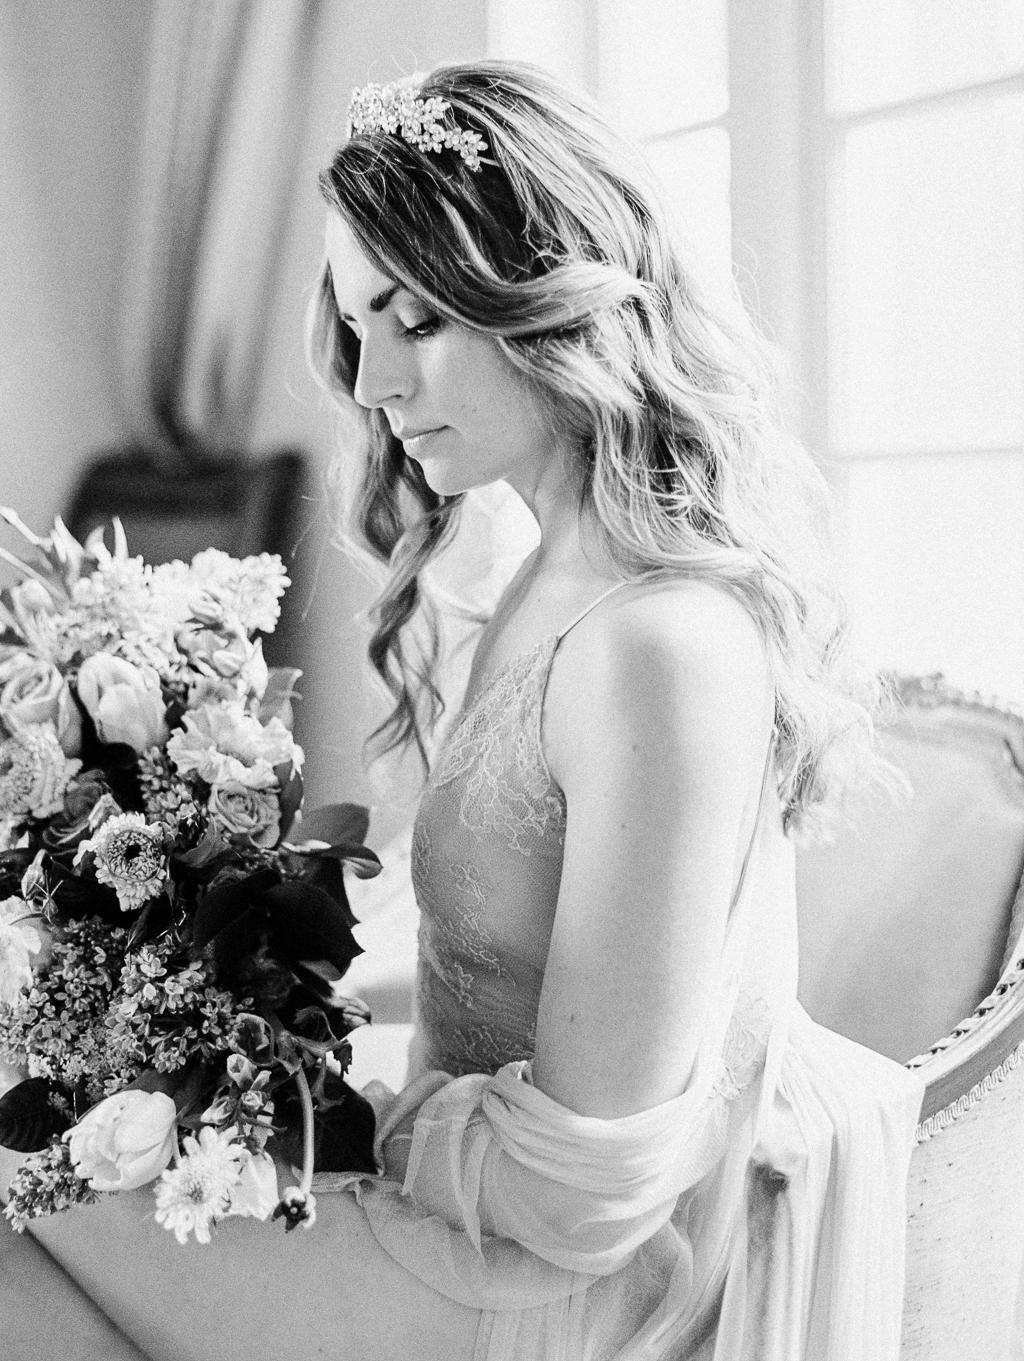 lindsay-marie-design-wedding-accessories-headpiece